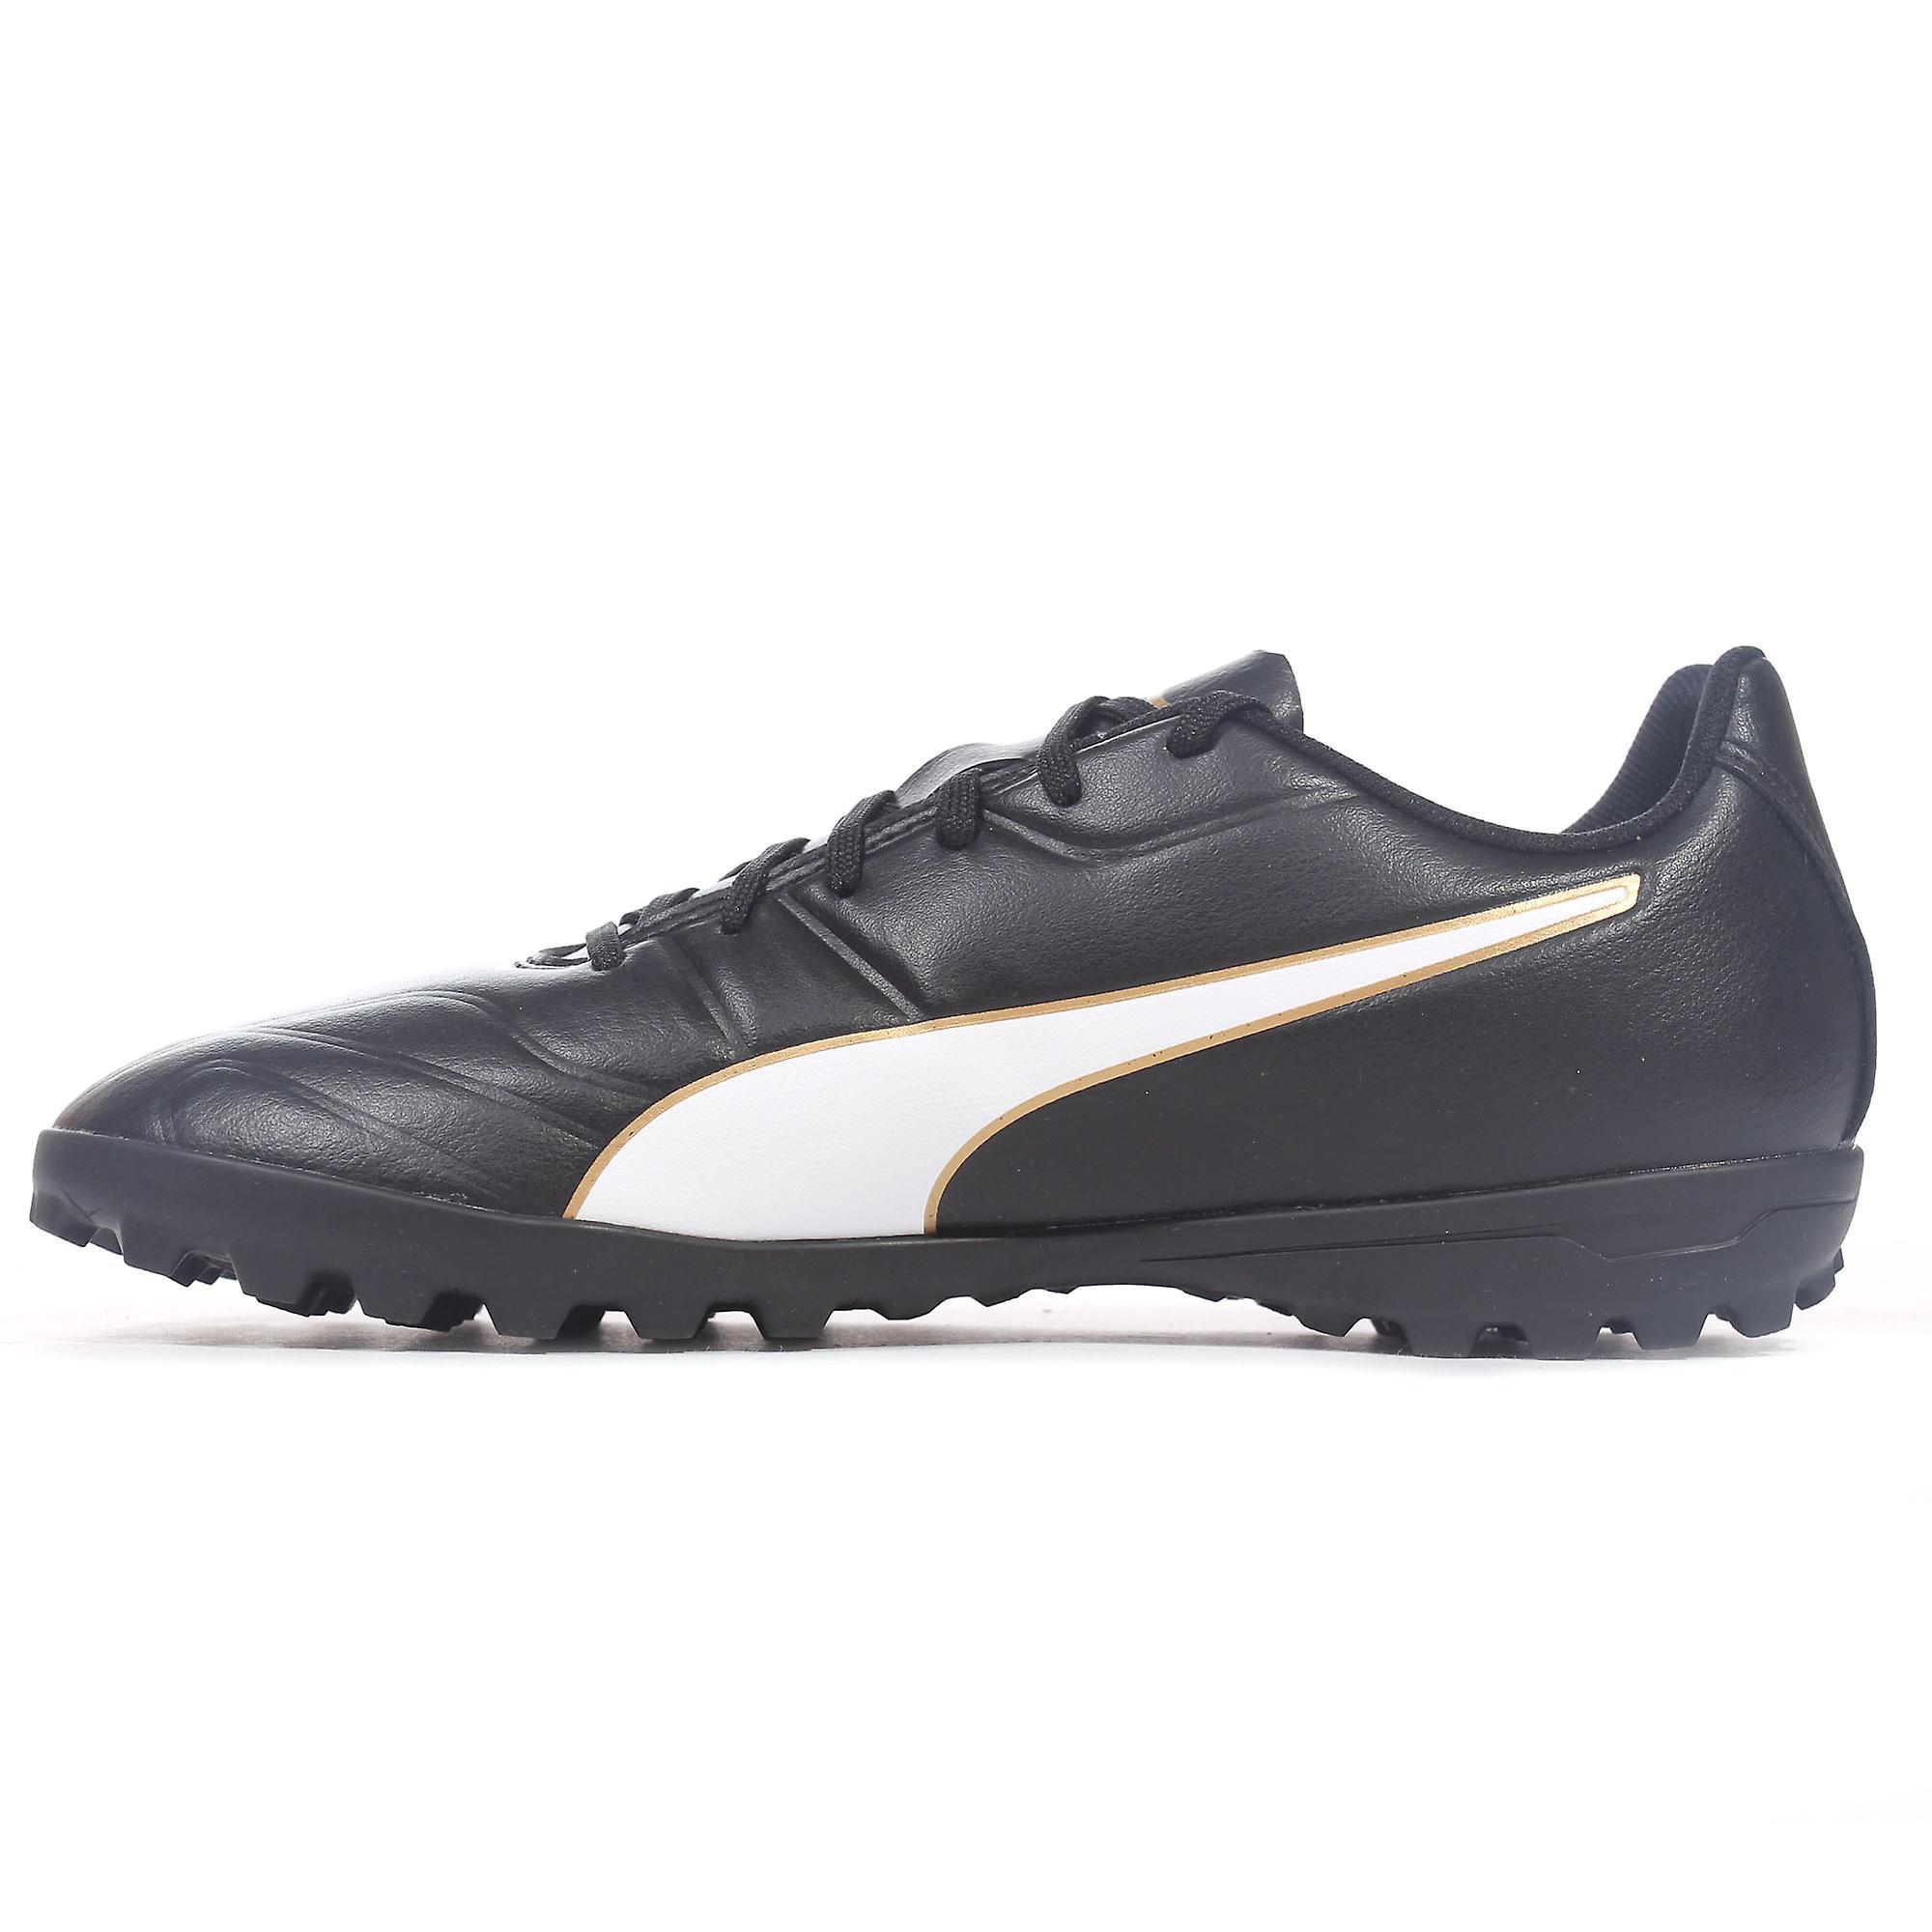 Puma Classico C II Mens Astro Turf Football Trainer Shoe Black/Gold